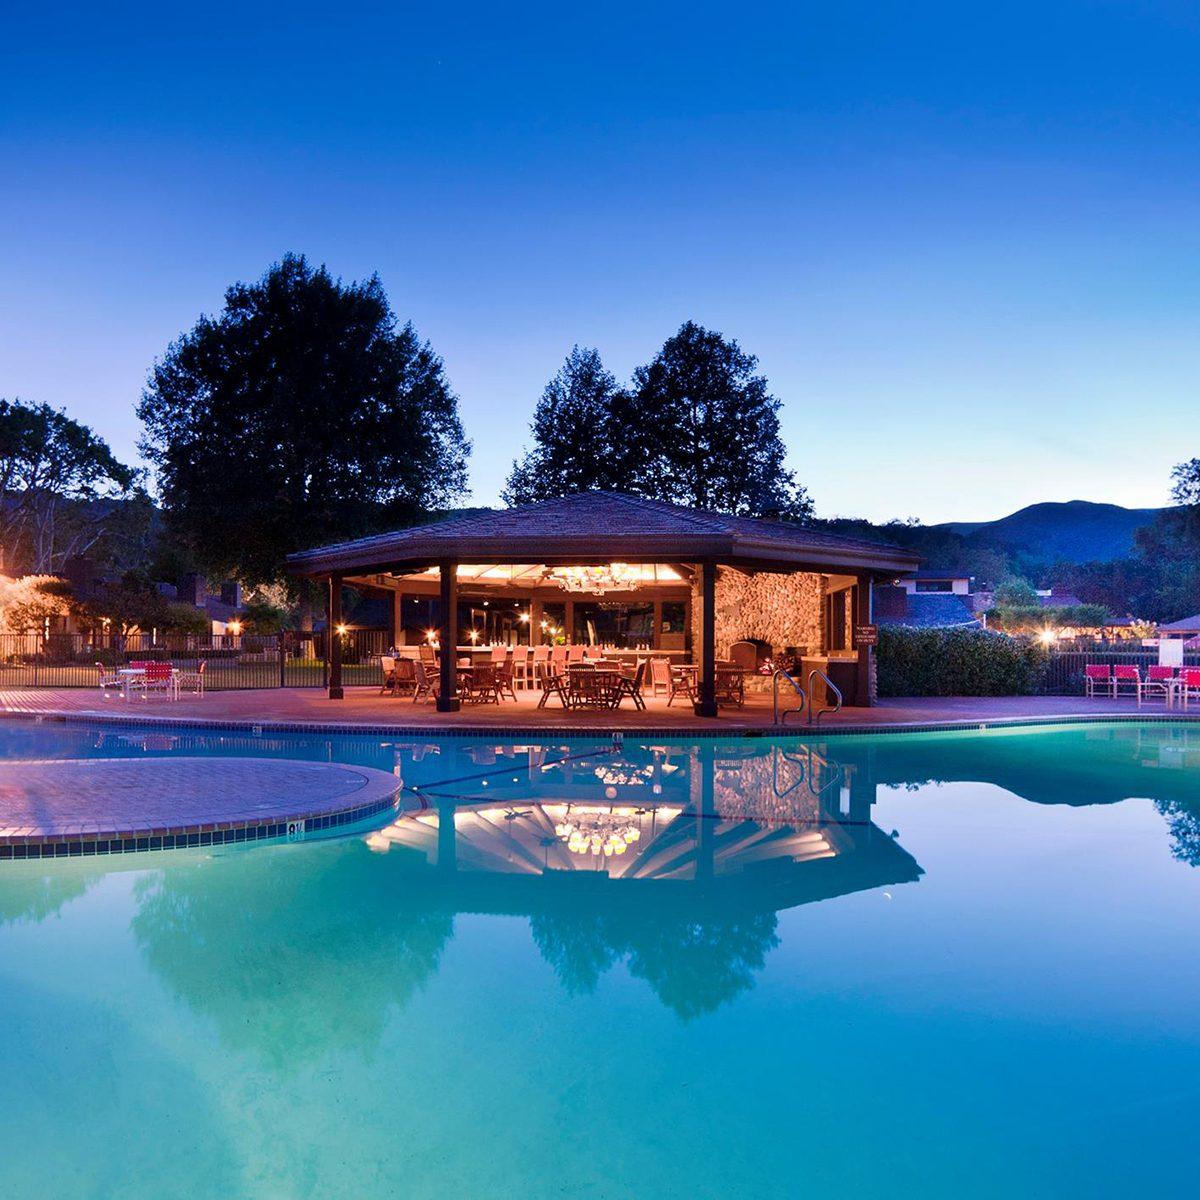 California Alisal Guest Ranch & Resort